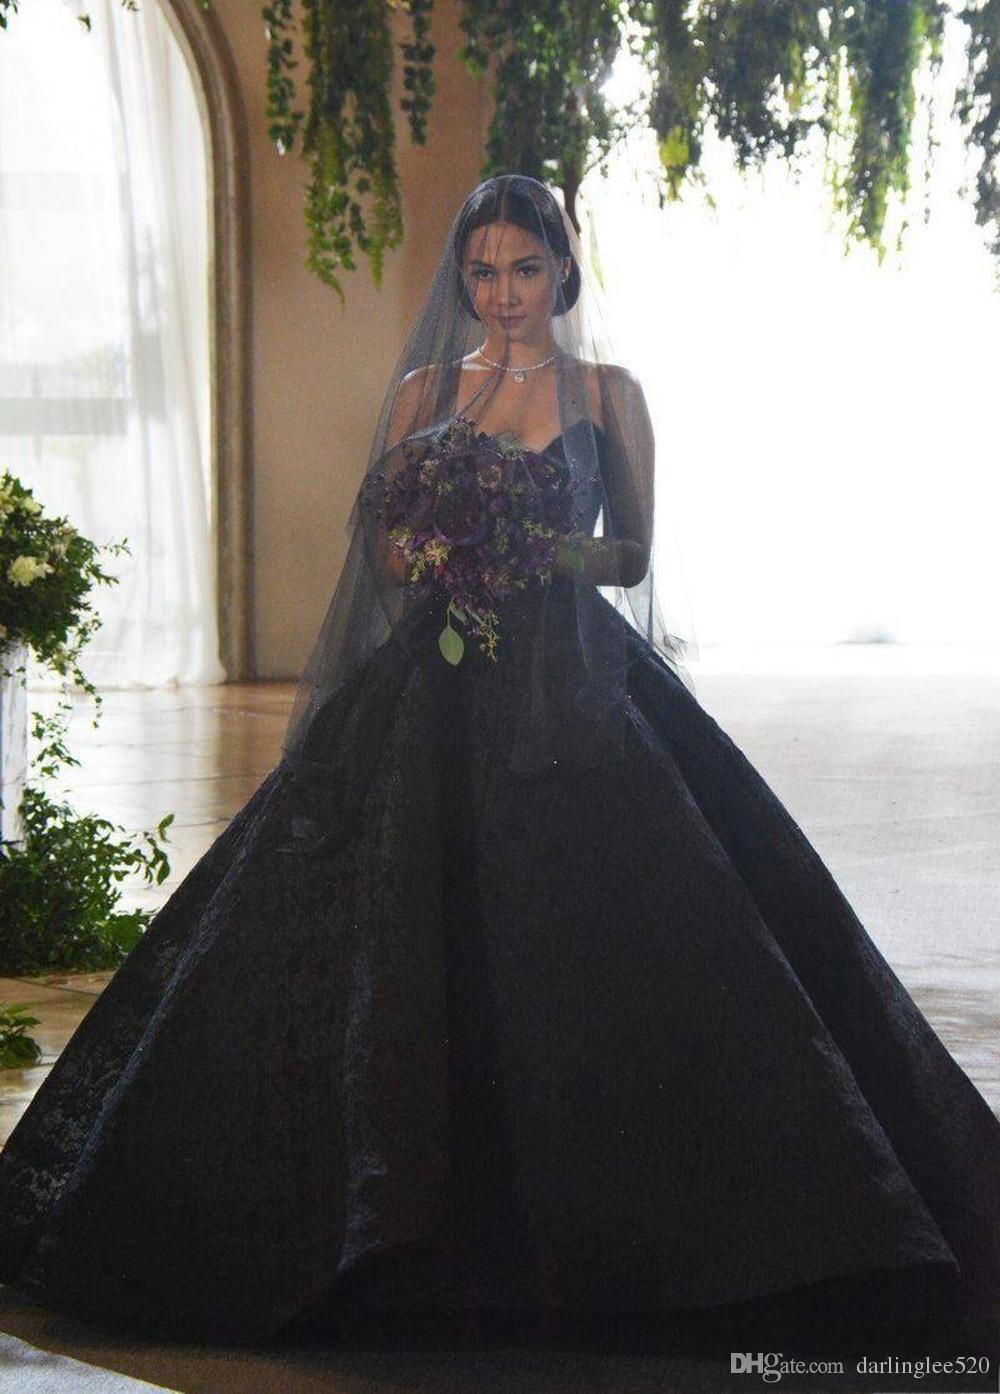 Compre Vestido De Novia Negro Vestido De Novia Vestido De Novia Sin Mangas Barrido Del Tren Perlas De Encaje Apliques Vestido De Novia Dubai áfrica